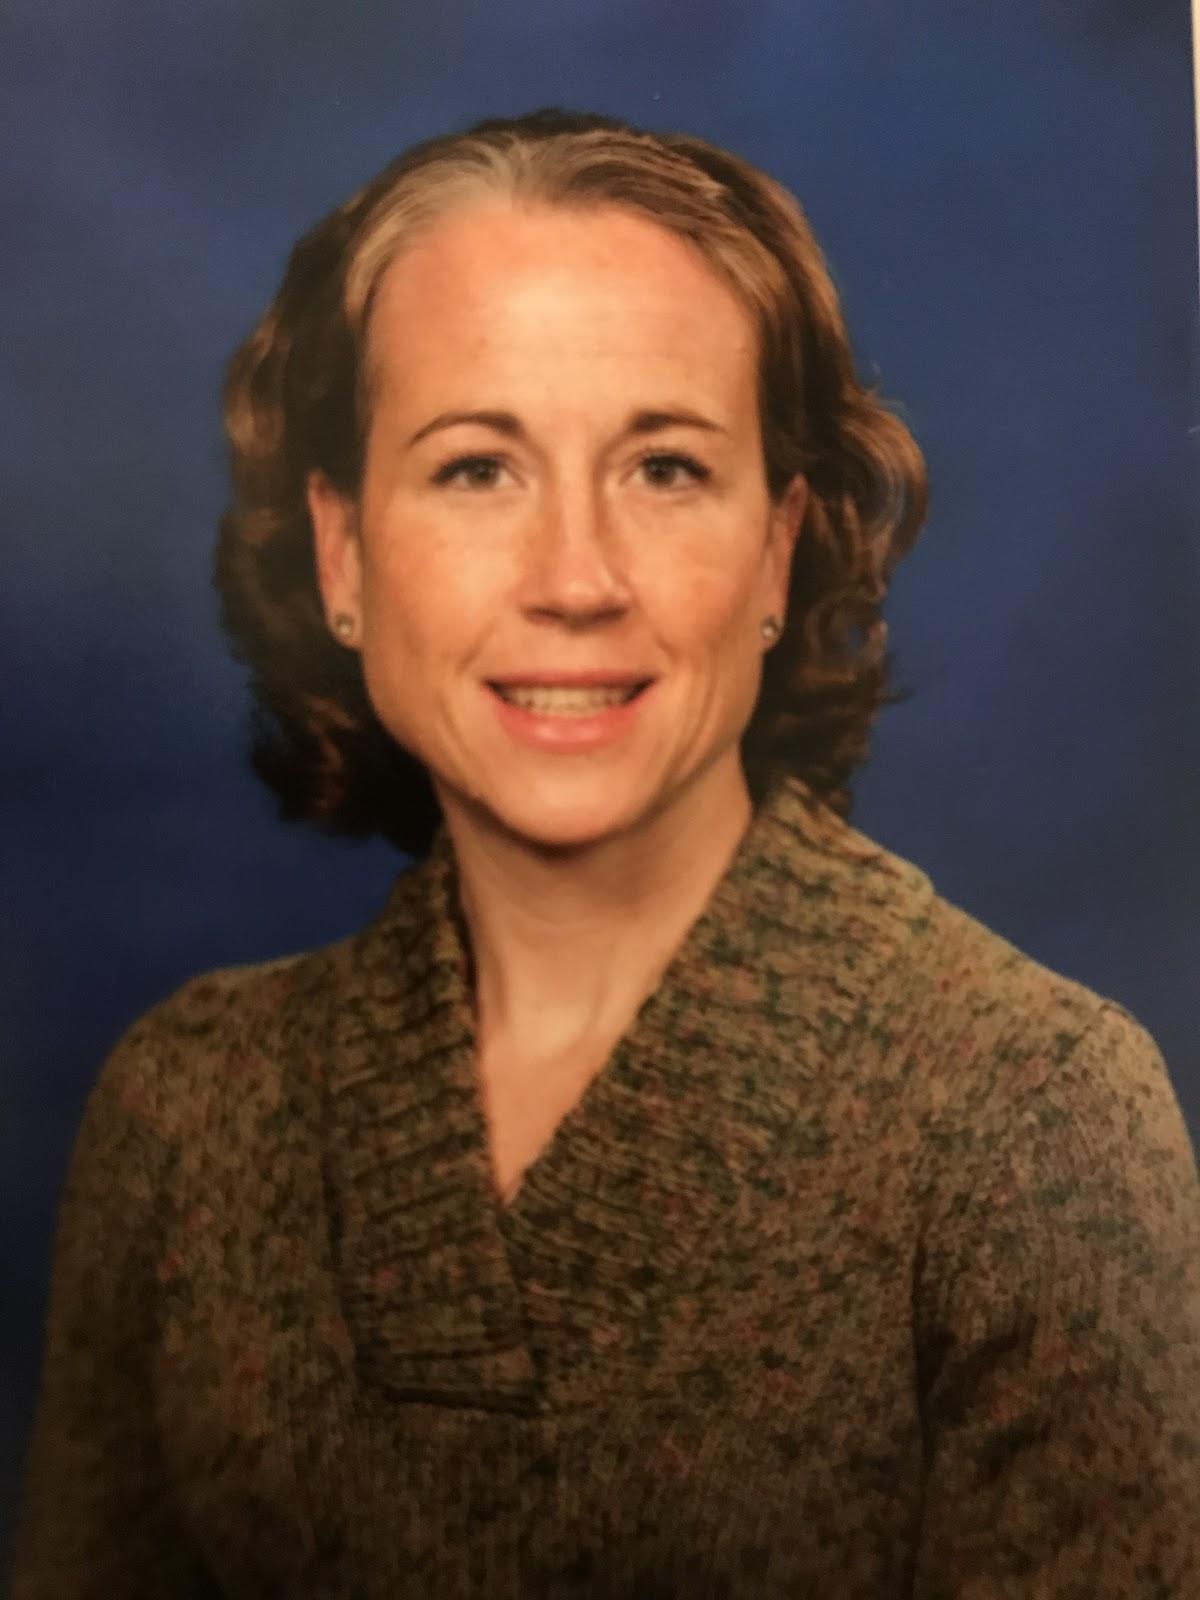 Portrait of Ms. Green